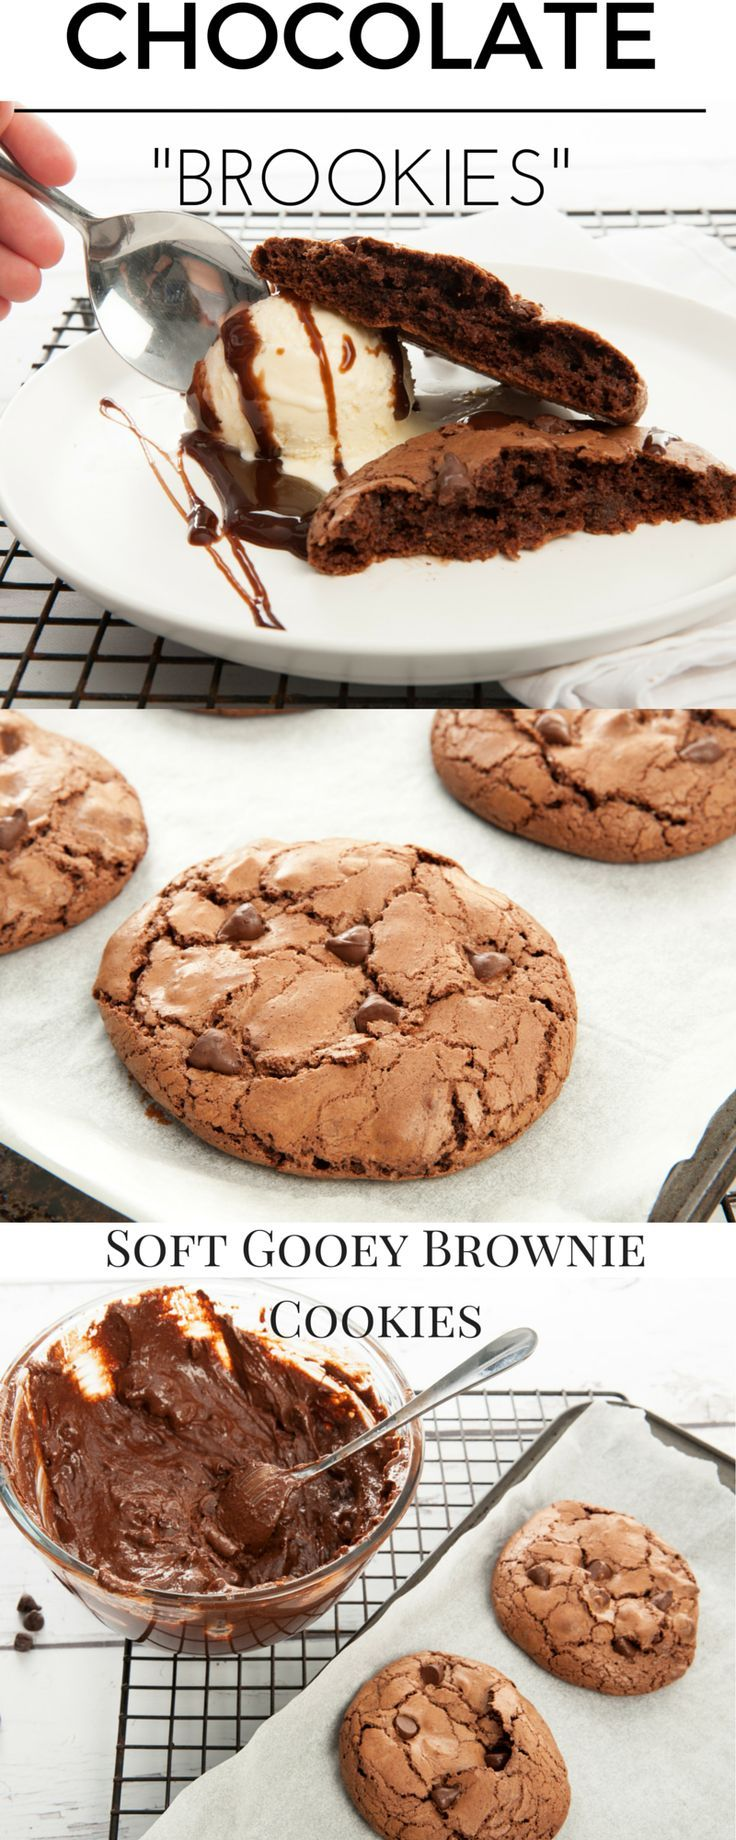 Masterchef Chocolate Brookie